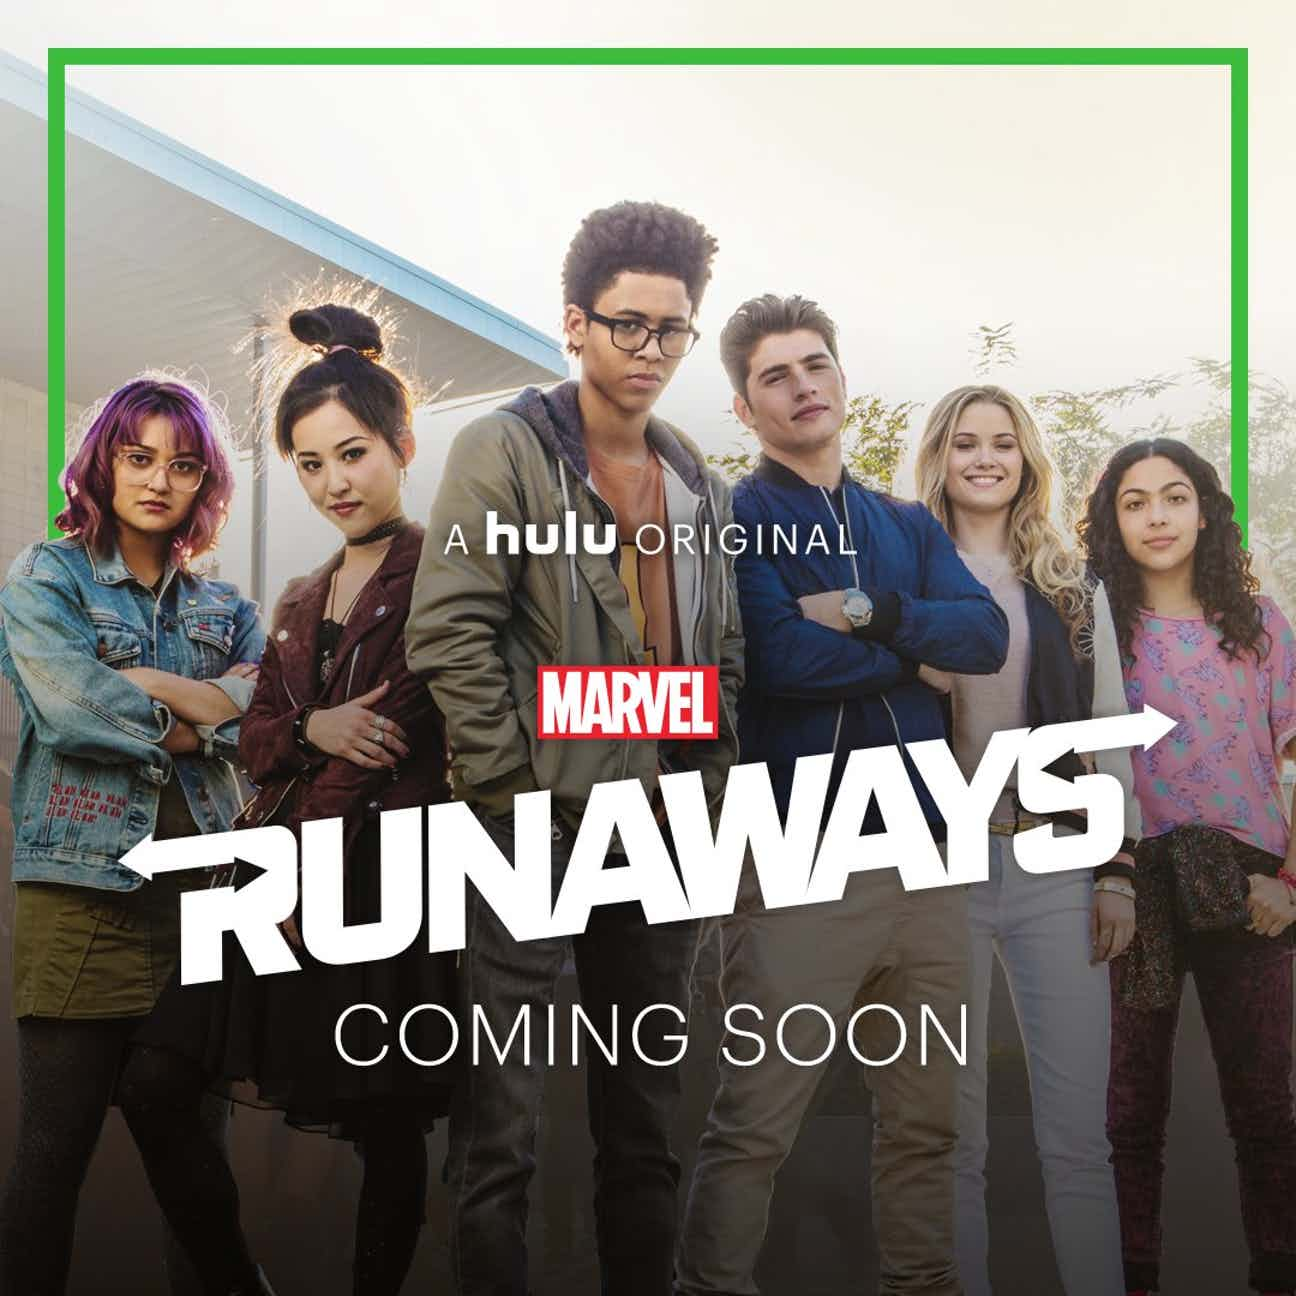 The Runaways, Runaways, Marvel, Hulu